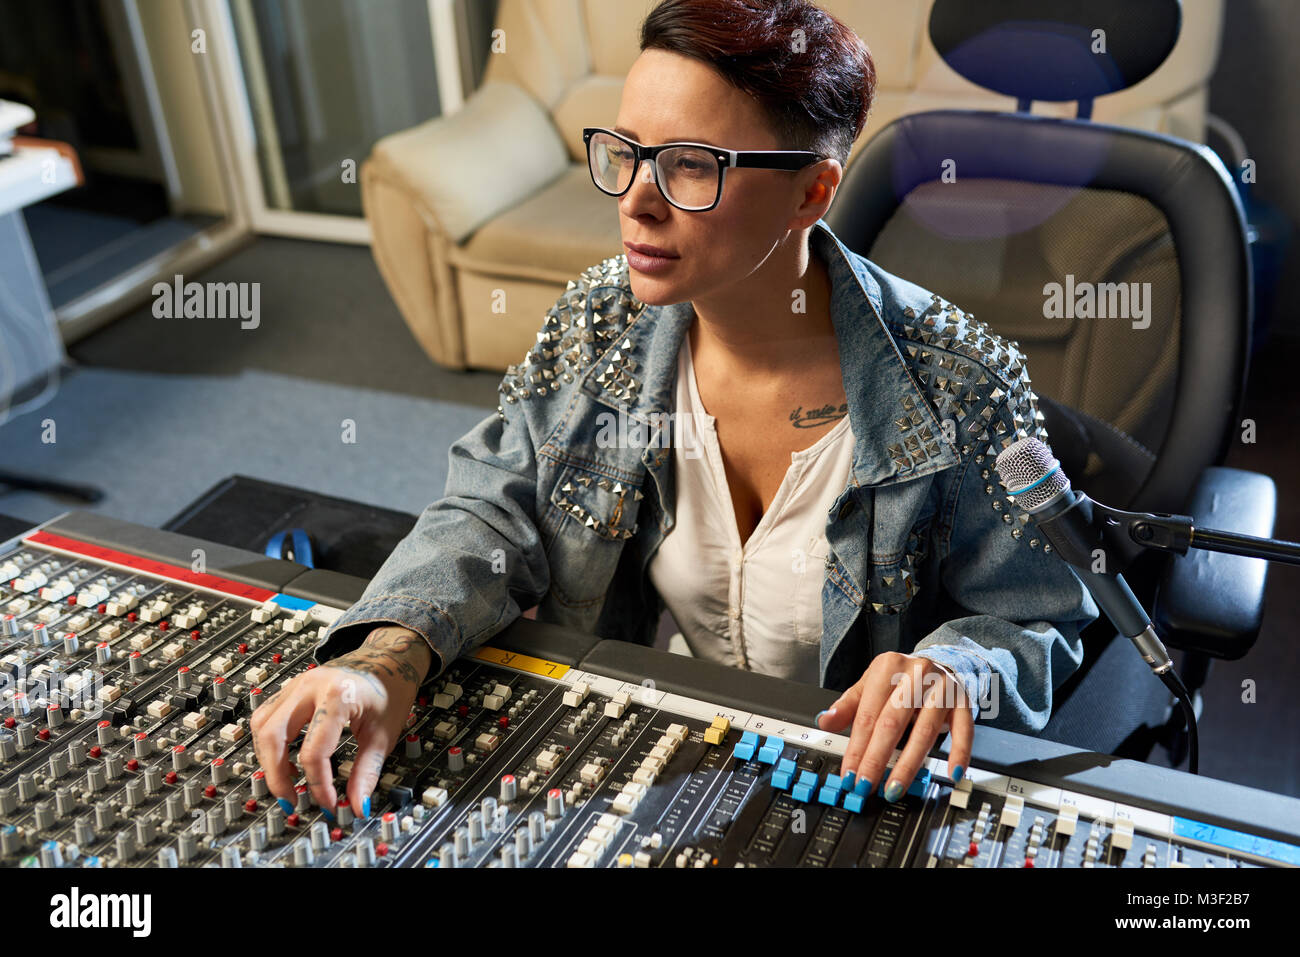 Pensive sound director using audio mixer in studio - Stock Image